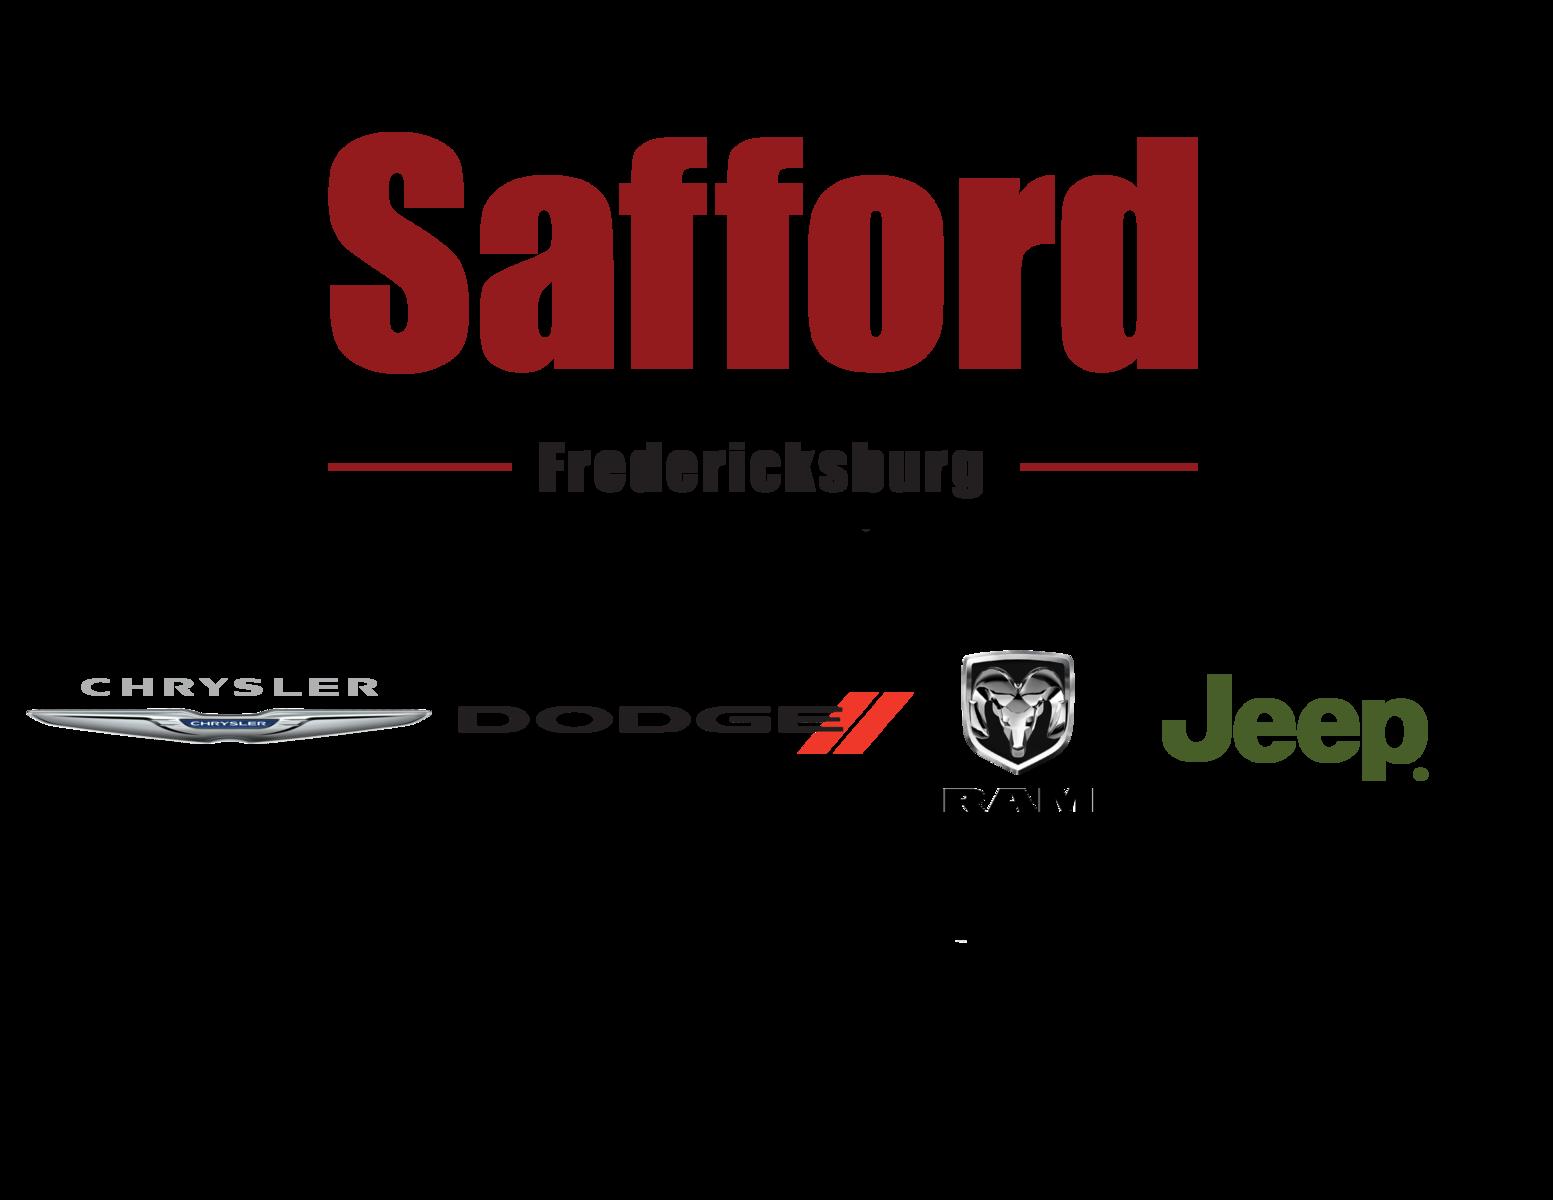 Safford Of Fredericksburg >> Safford Chrysler Jeep Dodge Ram Fiat Of Fredericksburg